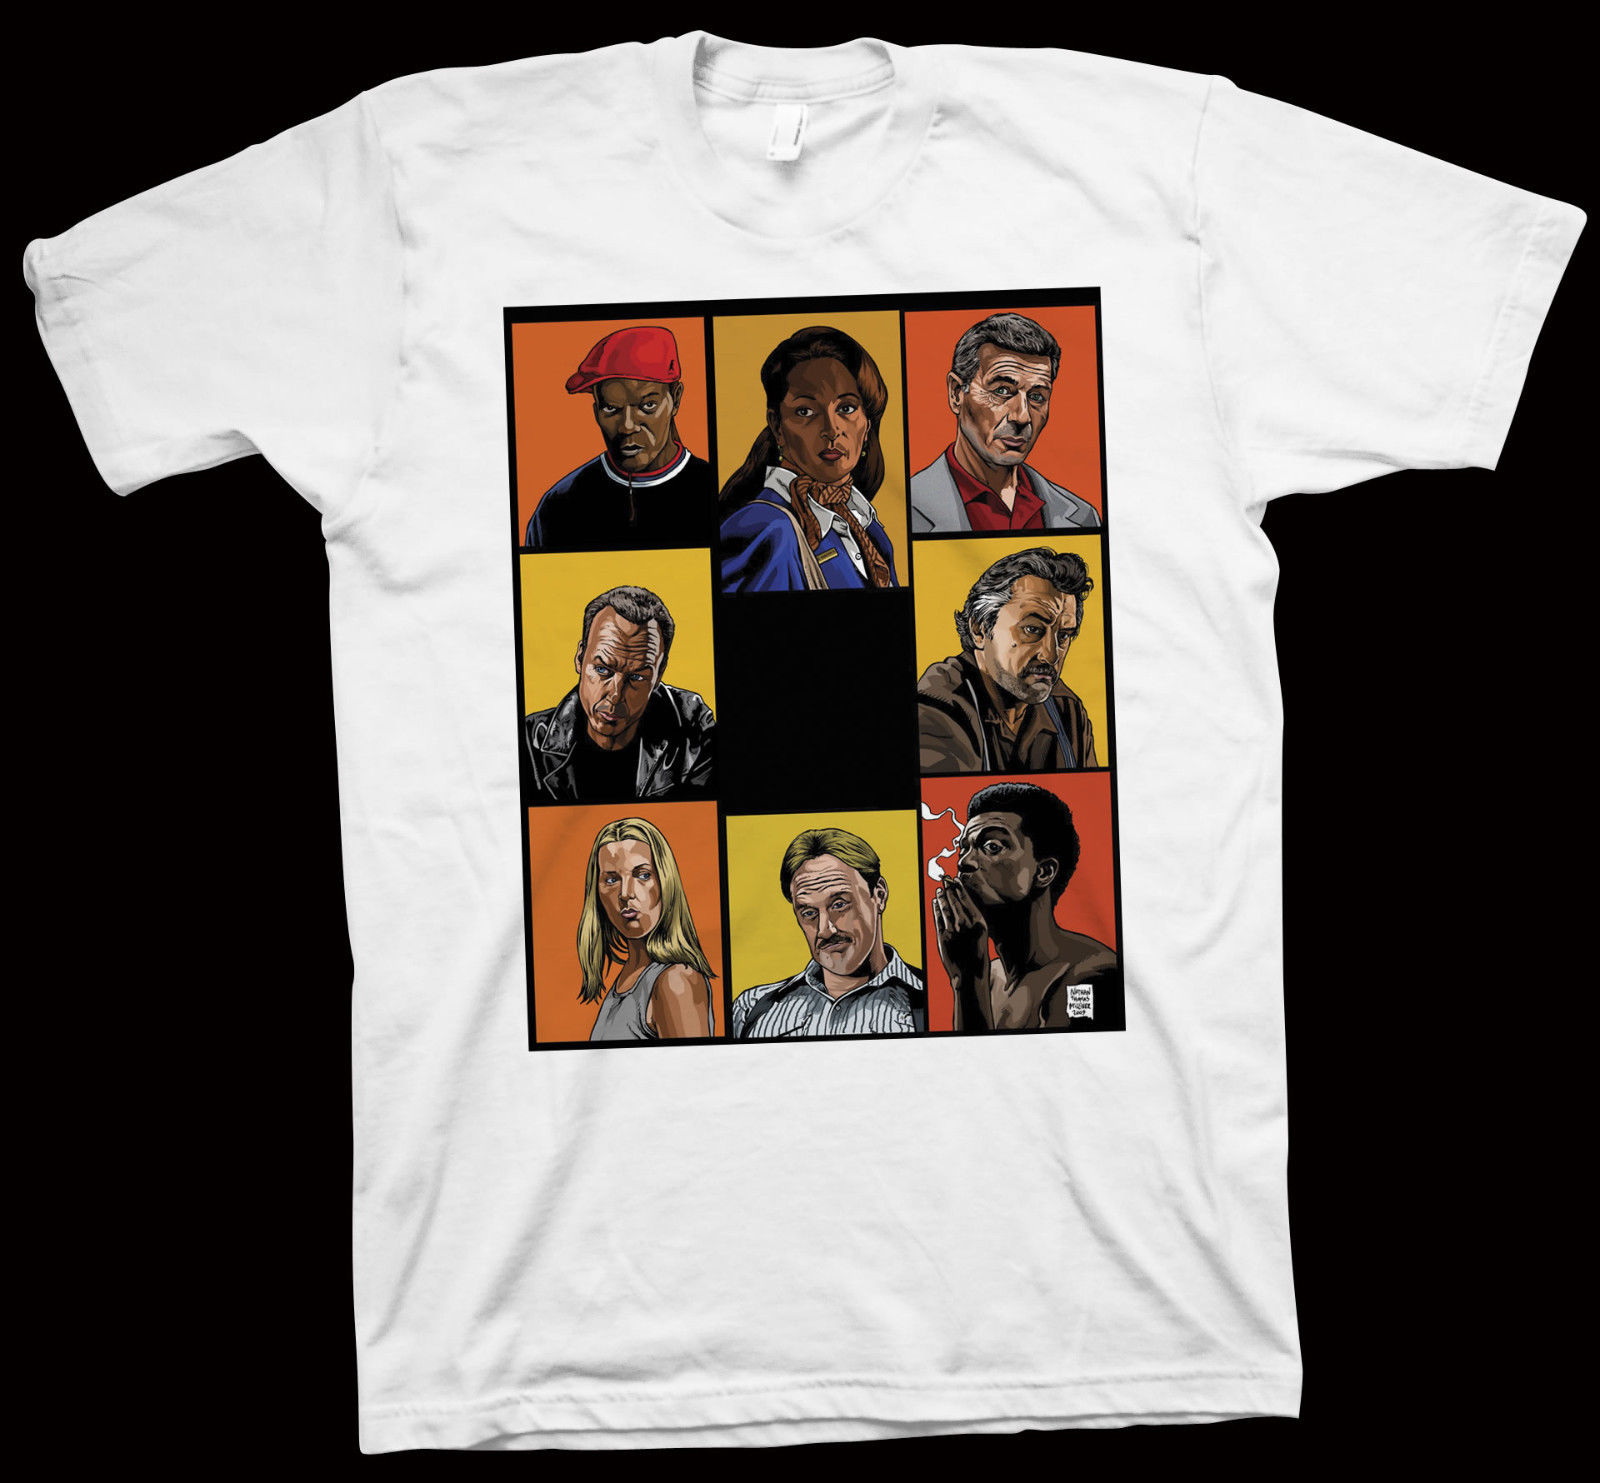 jackie-brown-t-shirt-quentin-font-b-tarantino-b-font-pam-grier-samuel-l-jackson-cinema-film